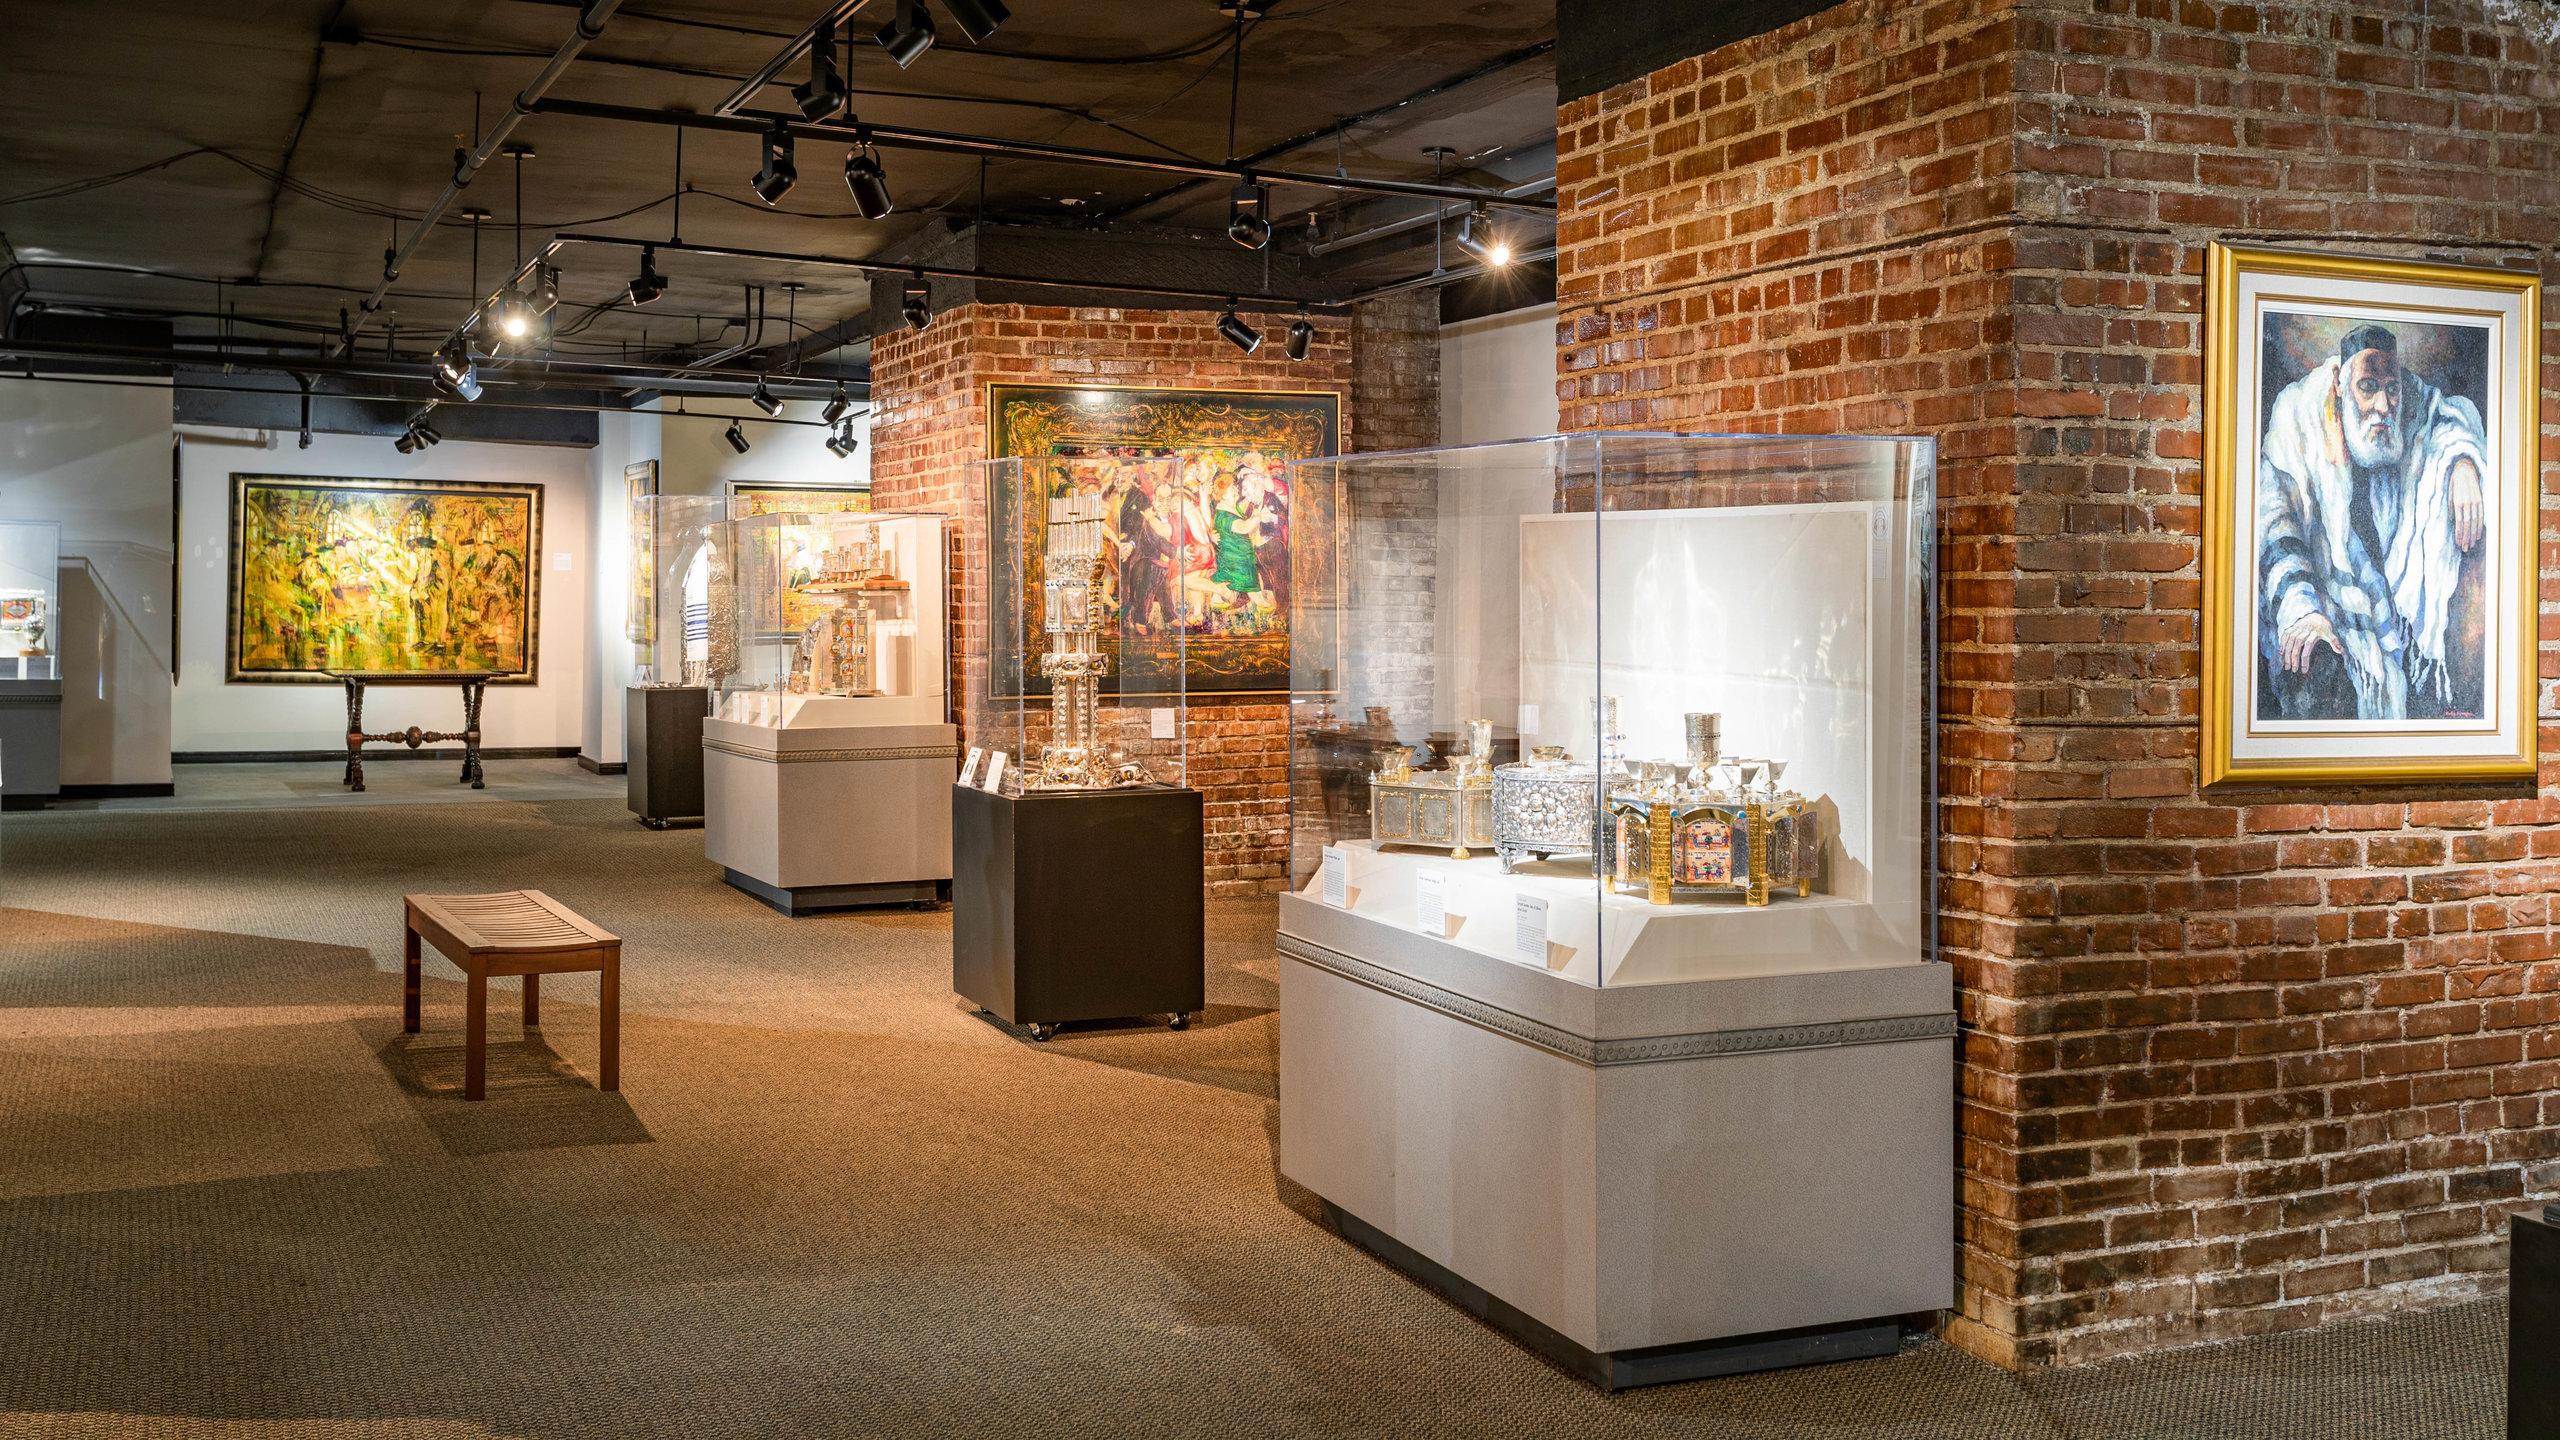 Belz Museum of Asian and Judaic Art, Memphis, Tennessee, Verenigde Staten